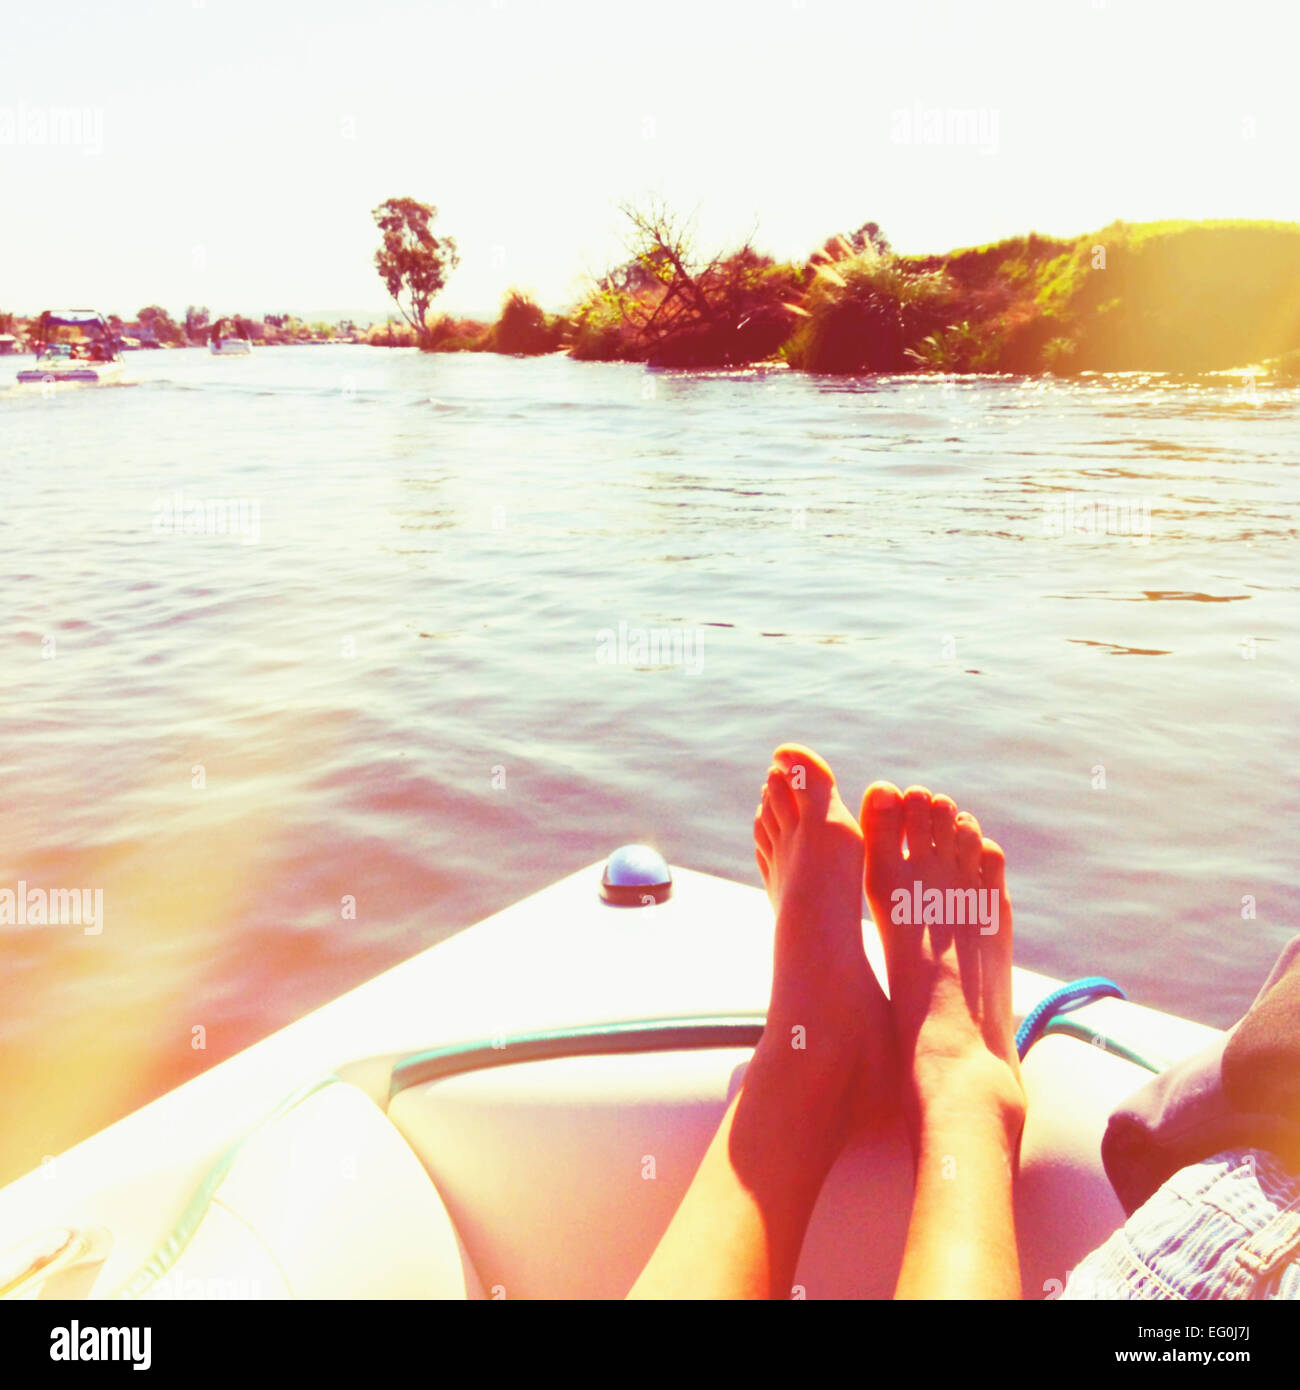 Donna relax su una barca a vela, California, America, STATI UNITI D'AMERICA Immagini Stock